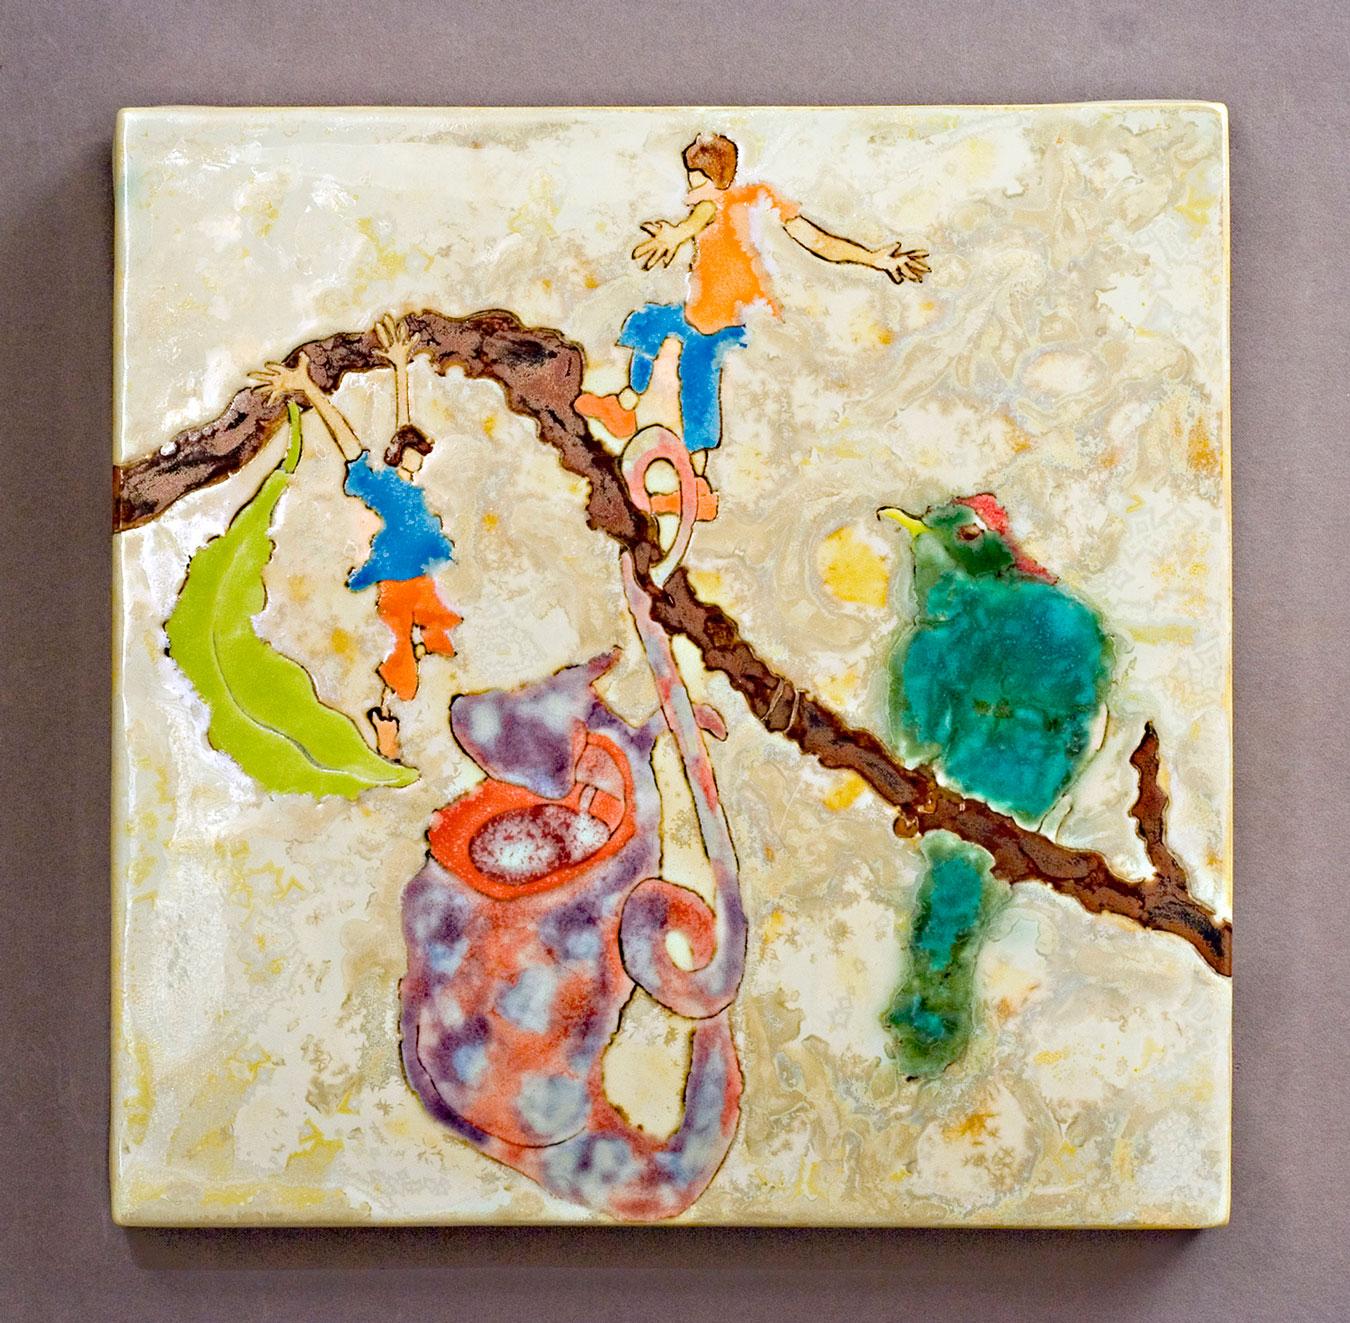 Girls-and-Bird-Ceramic-Art-Painting-Samantha-Henneke.jpg